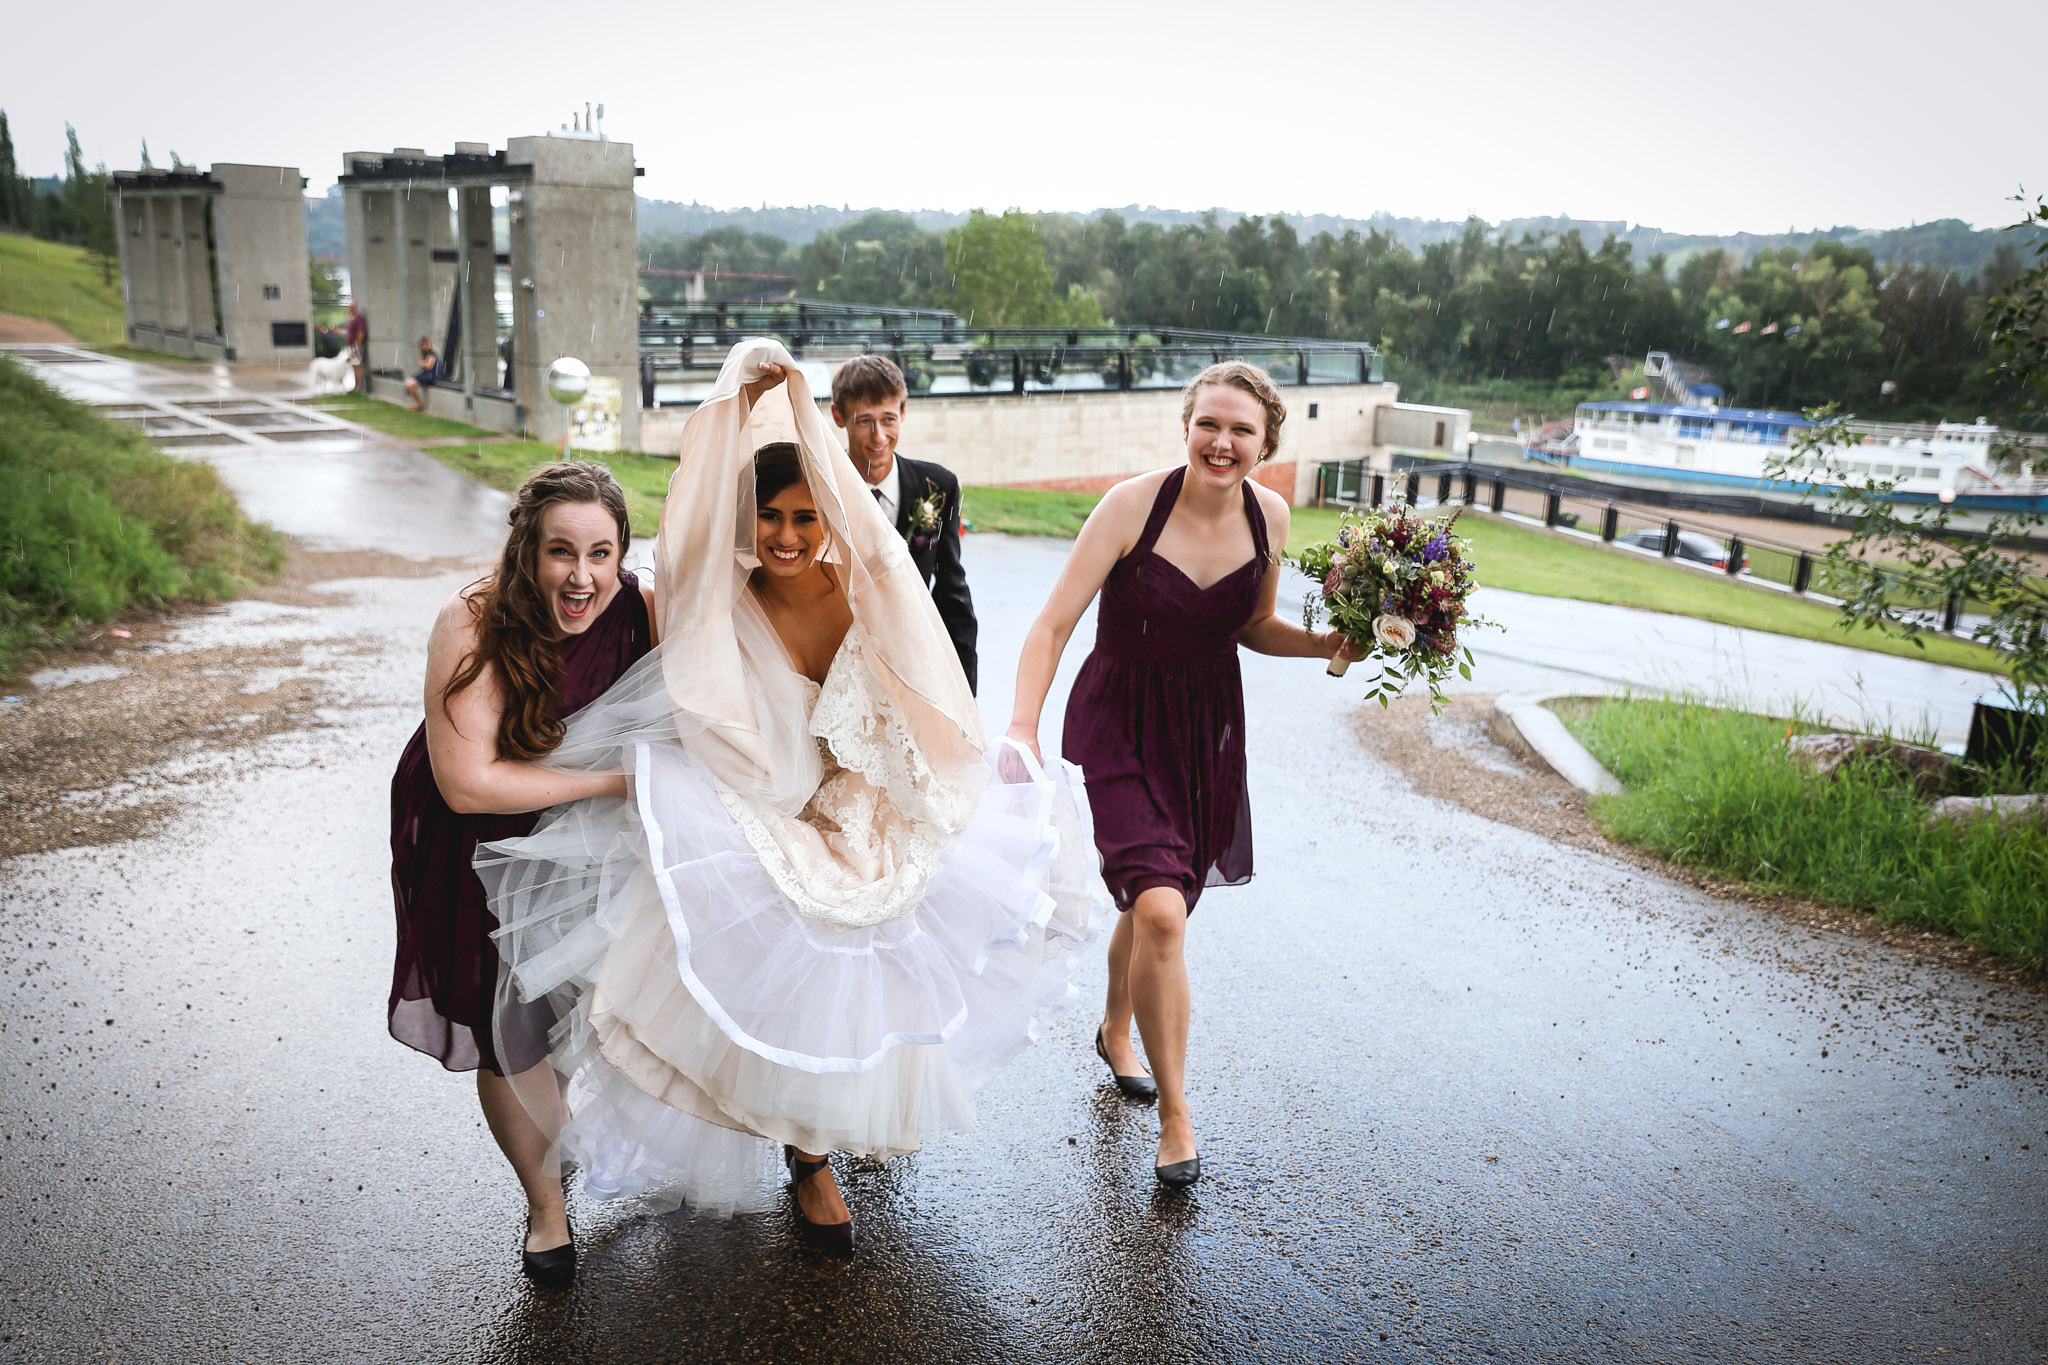 wedding photography, wedding photographers, elopement photography, engagement photos, calgary photographer, Kananaskis, Rocky Mountain, Canmore photographer,